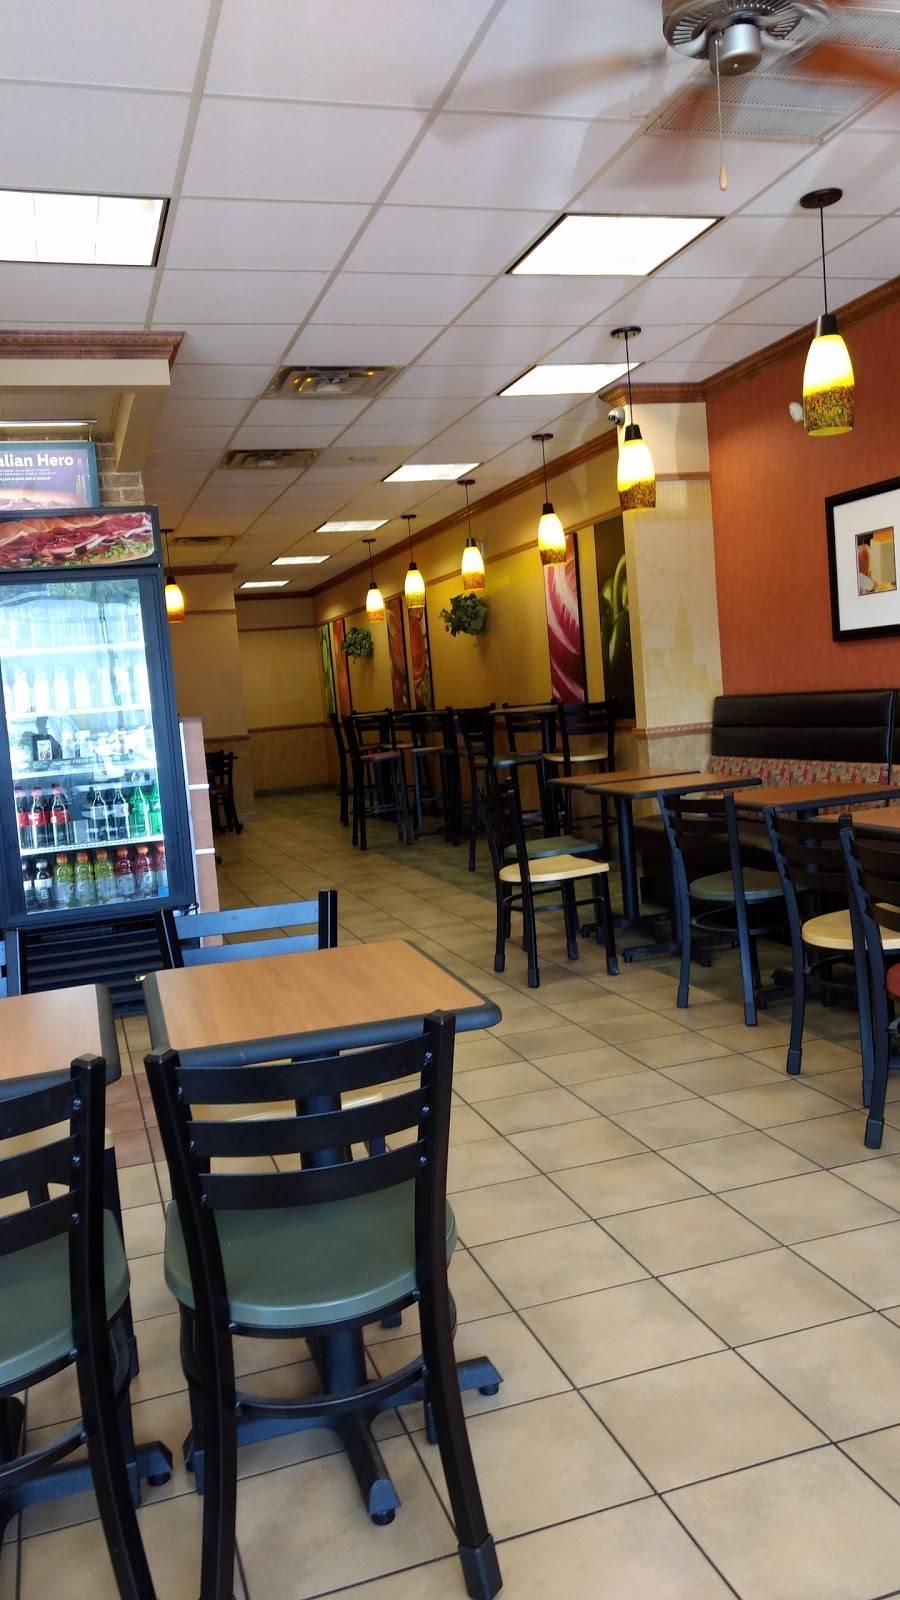 Subway - meal takeaway  | Photo 3 of 10 | Address: 8875 - A Highland Rd, Baton Rouge, LA 70808, USA | Phone: (225) 769-0034